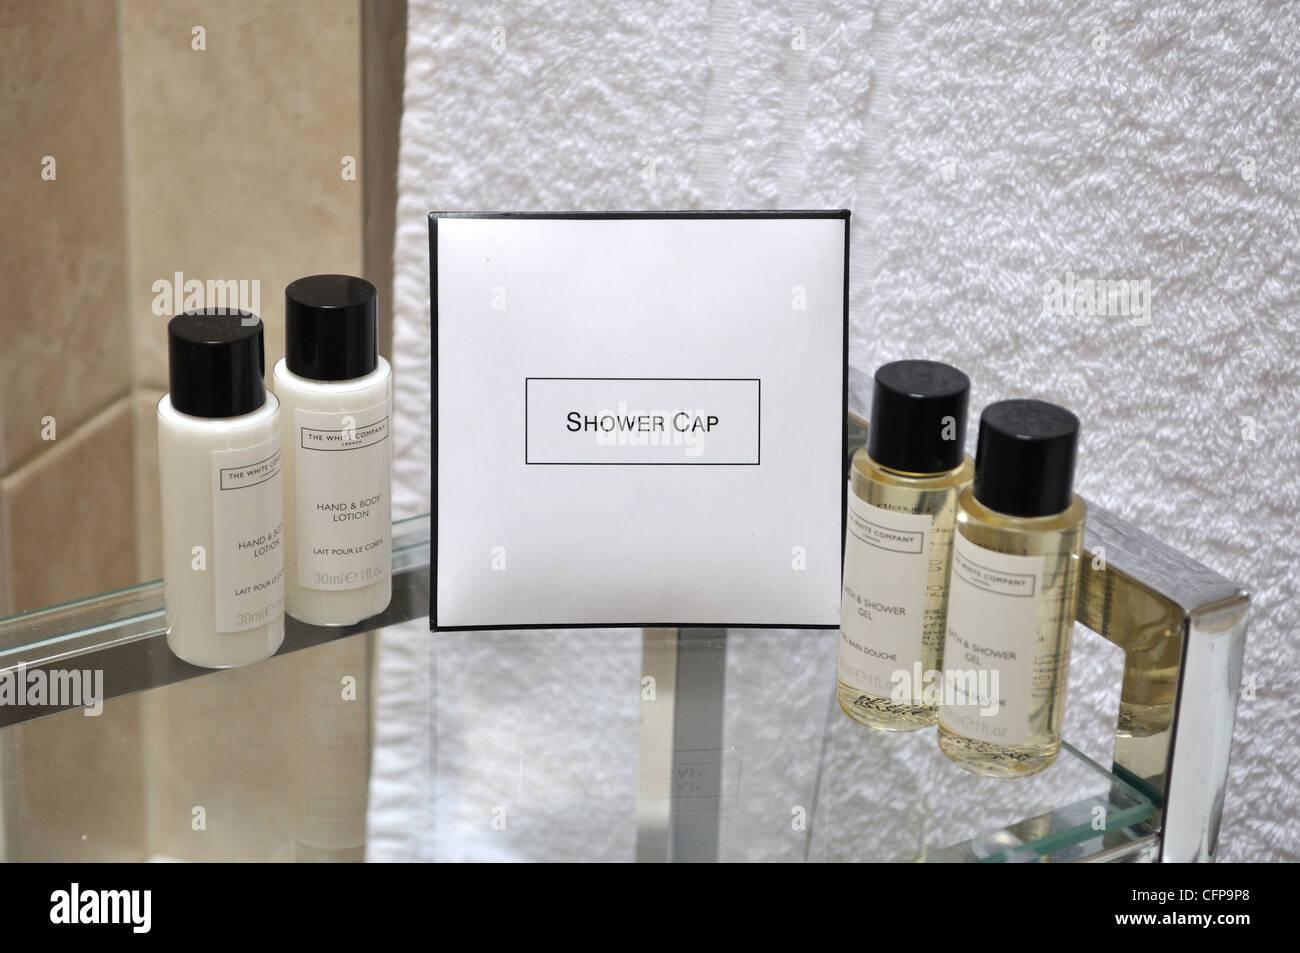 Shower cap bathroom toiletries - Stock Image